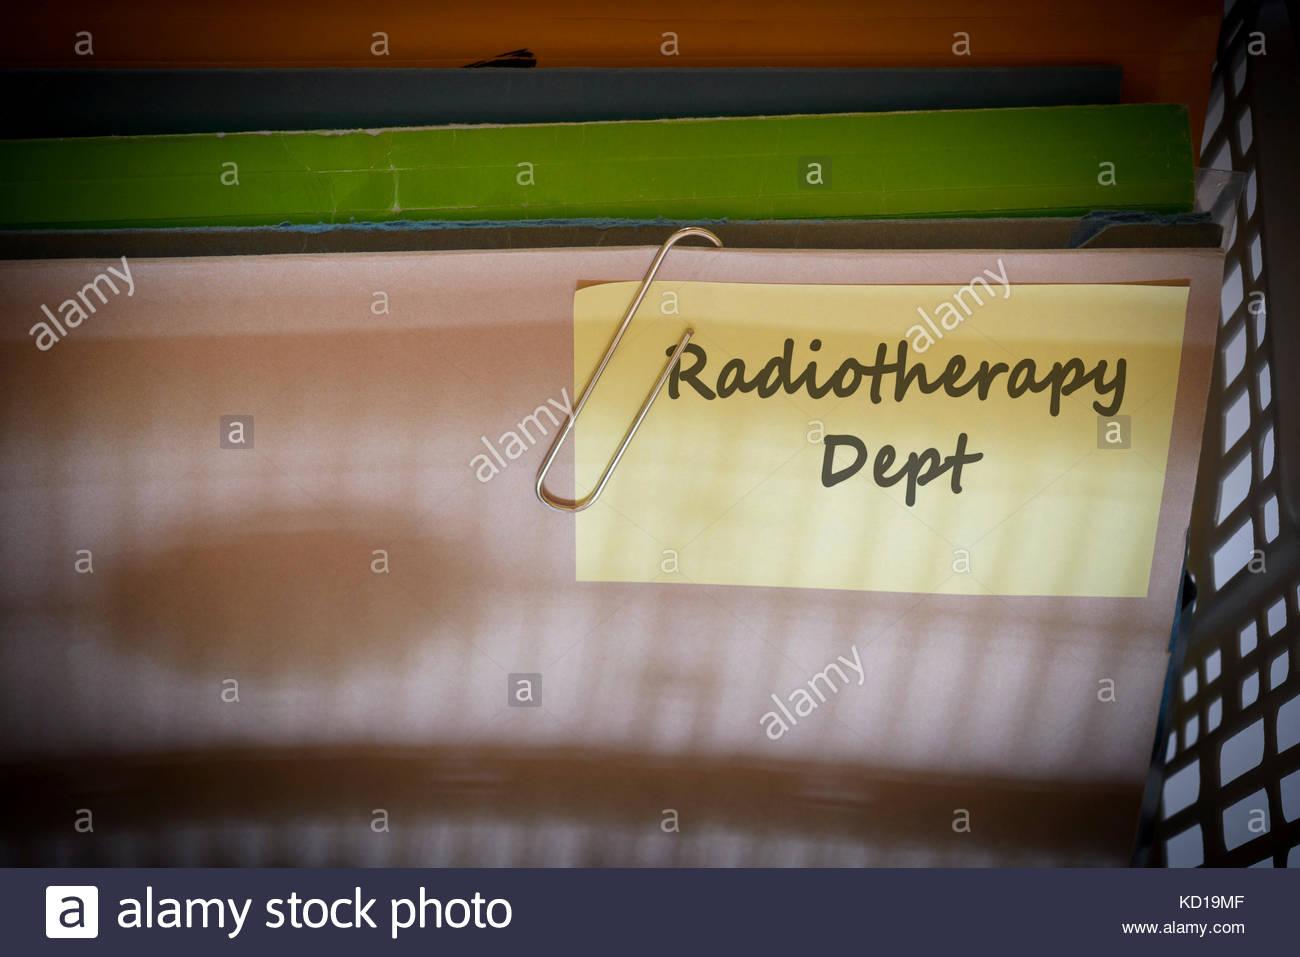 Radiotherapy Dept written on document folder, Dorset, England. - Stock Image